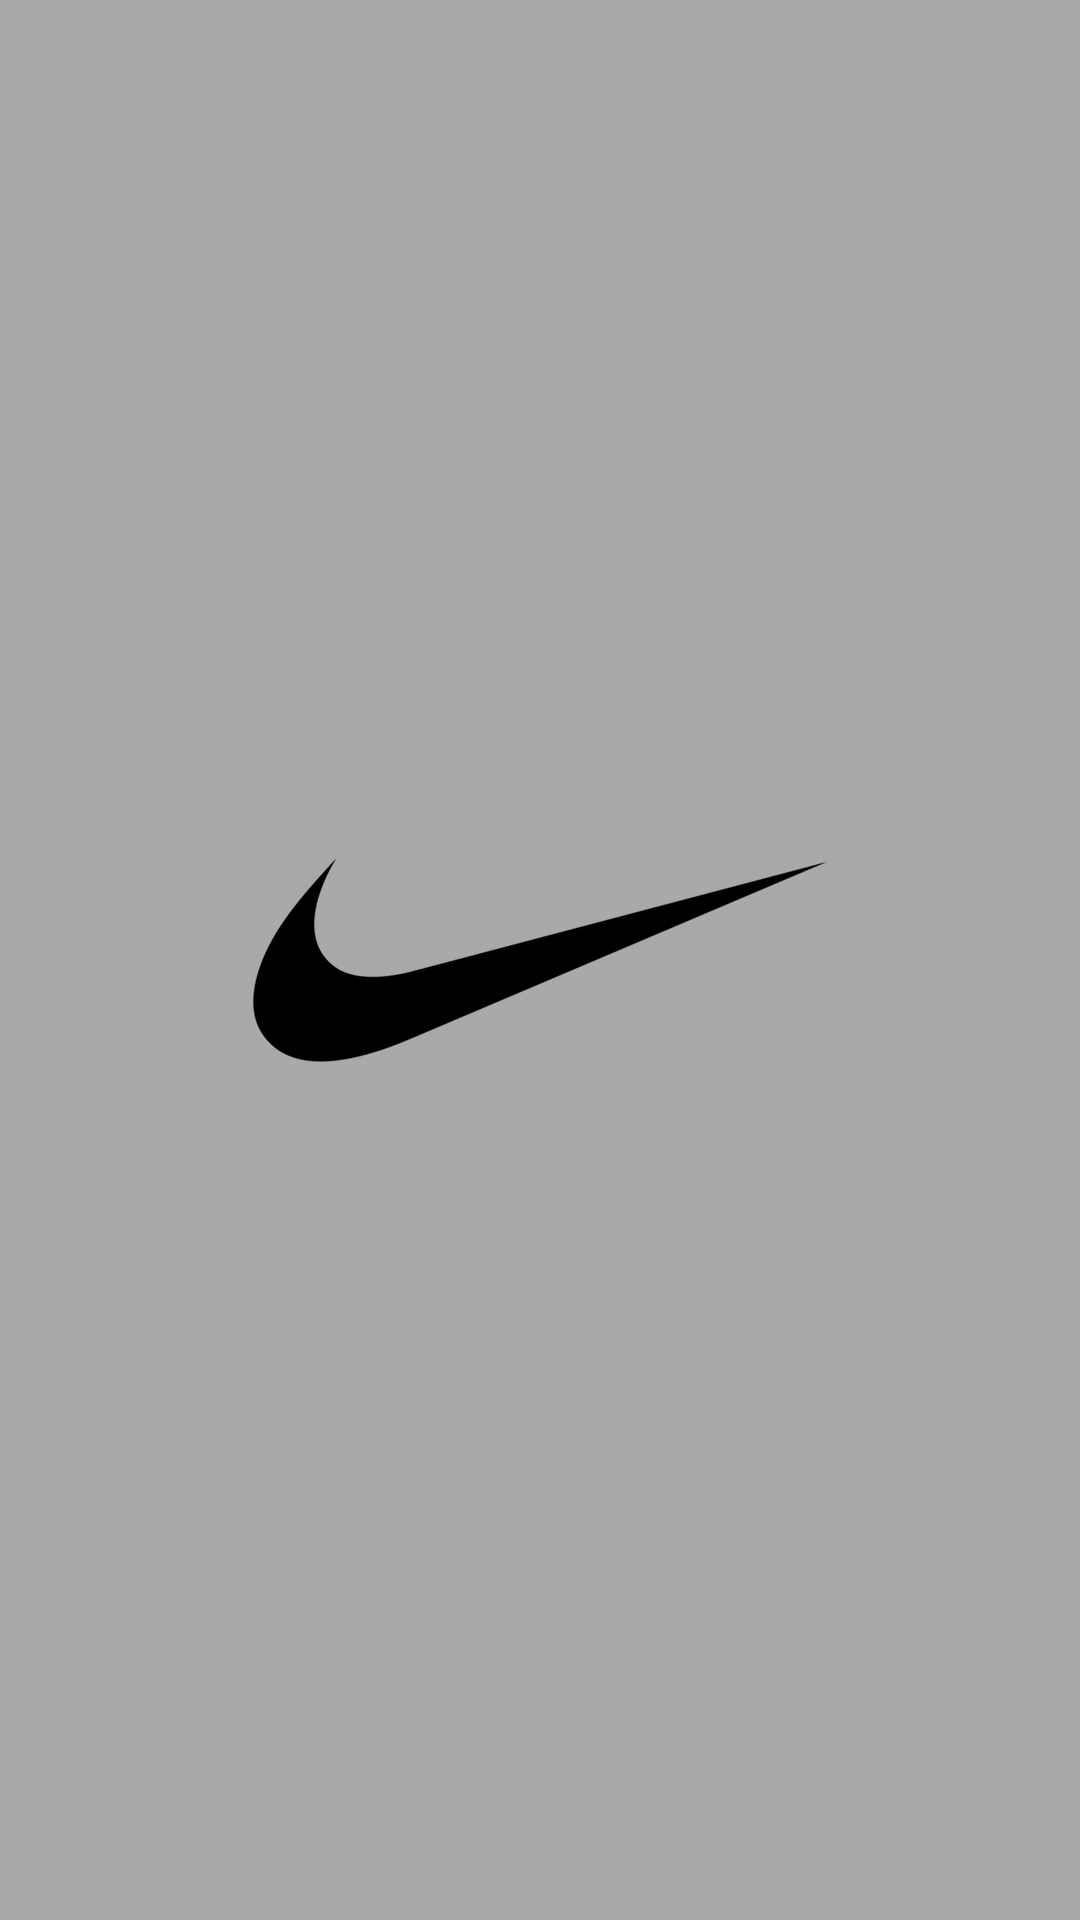 Nike ナイキ の高画質スマホ壁紙37枚 スマホ壁紙 ナイキ ナイキ 待ち受け